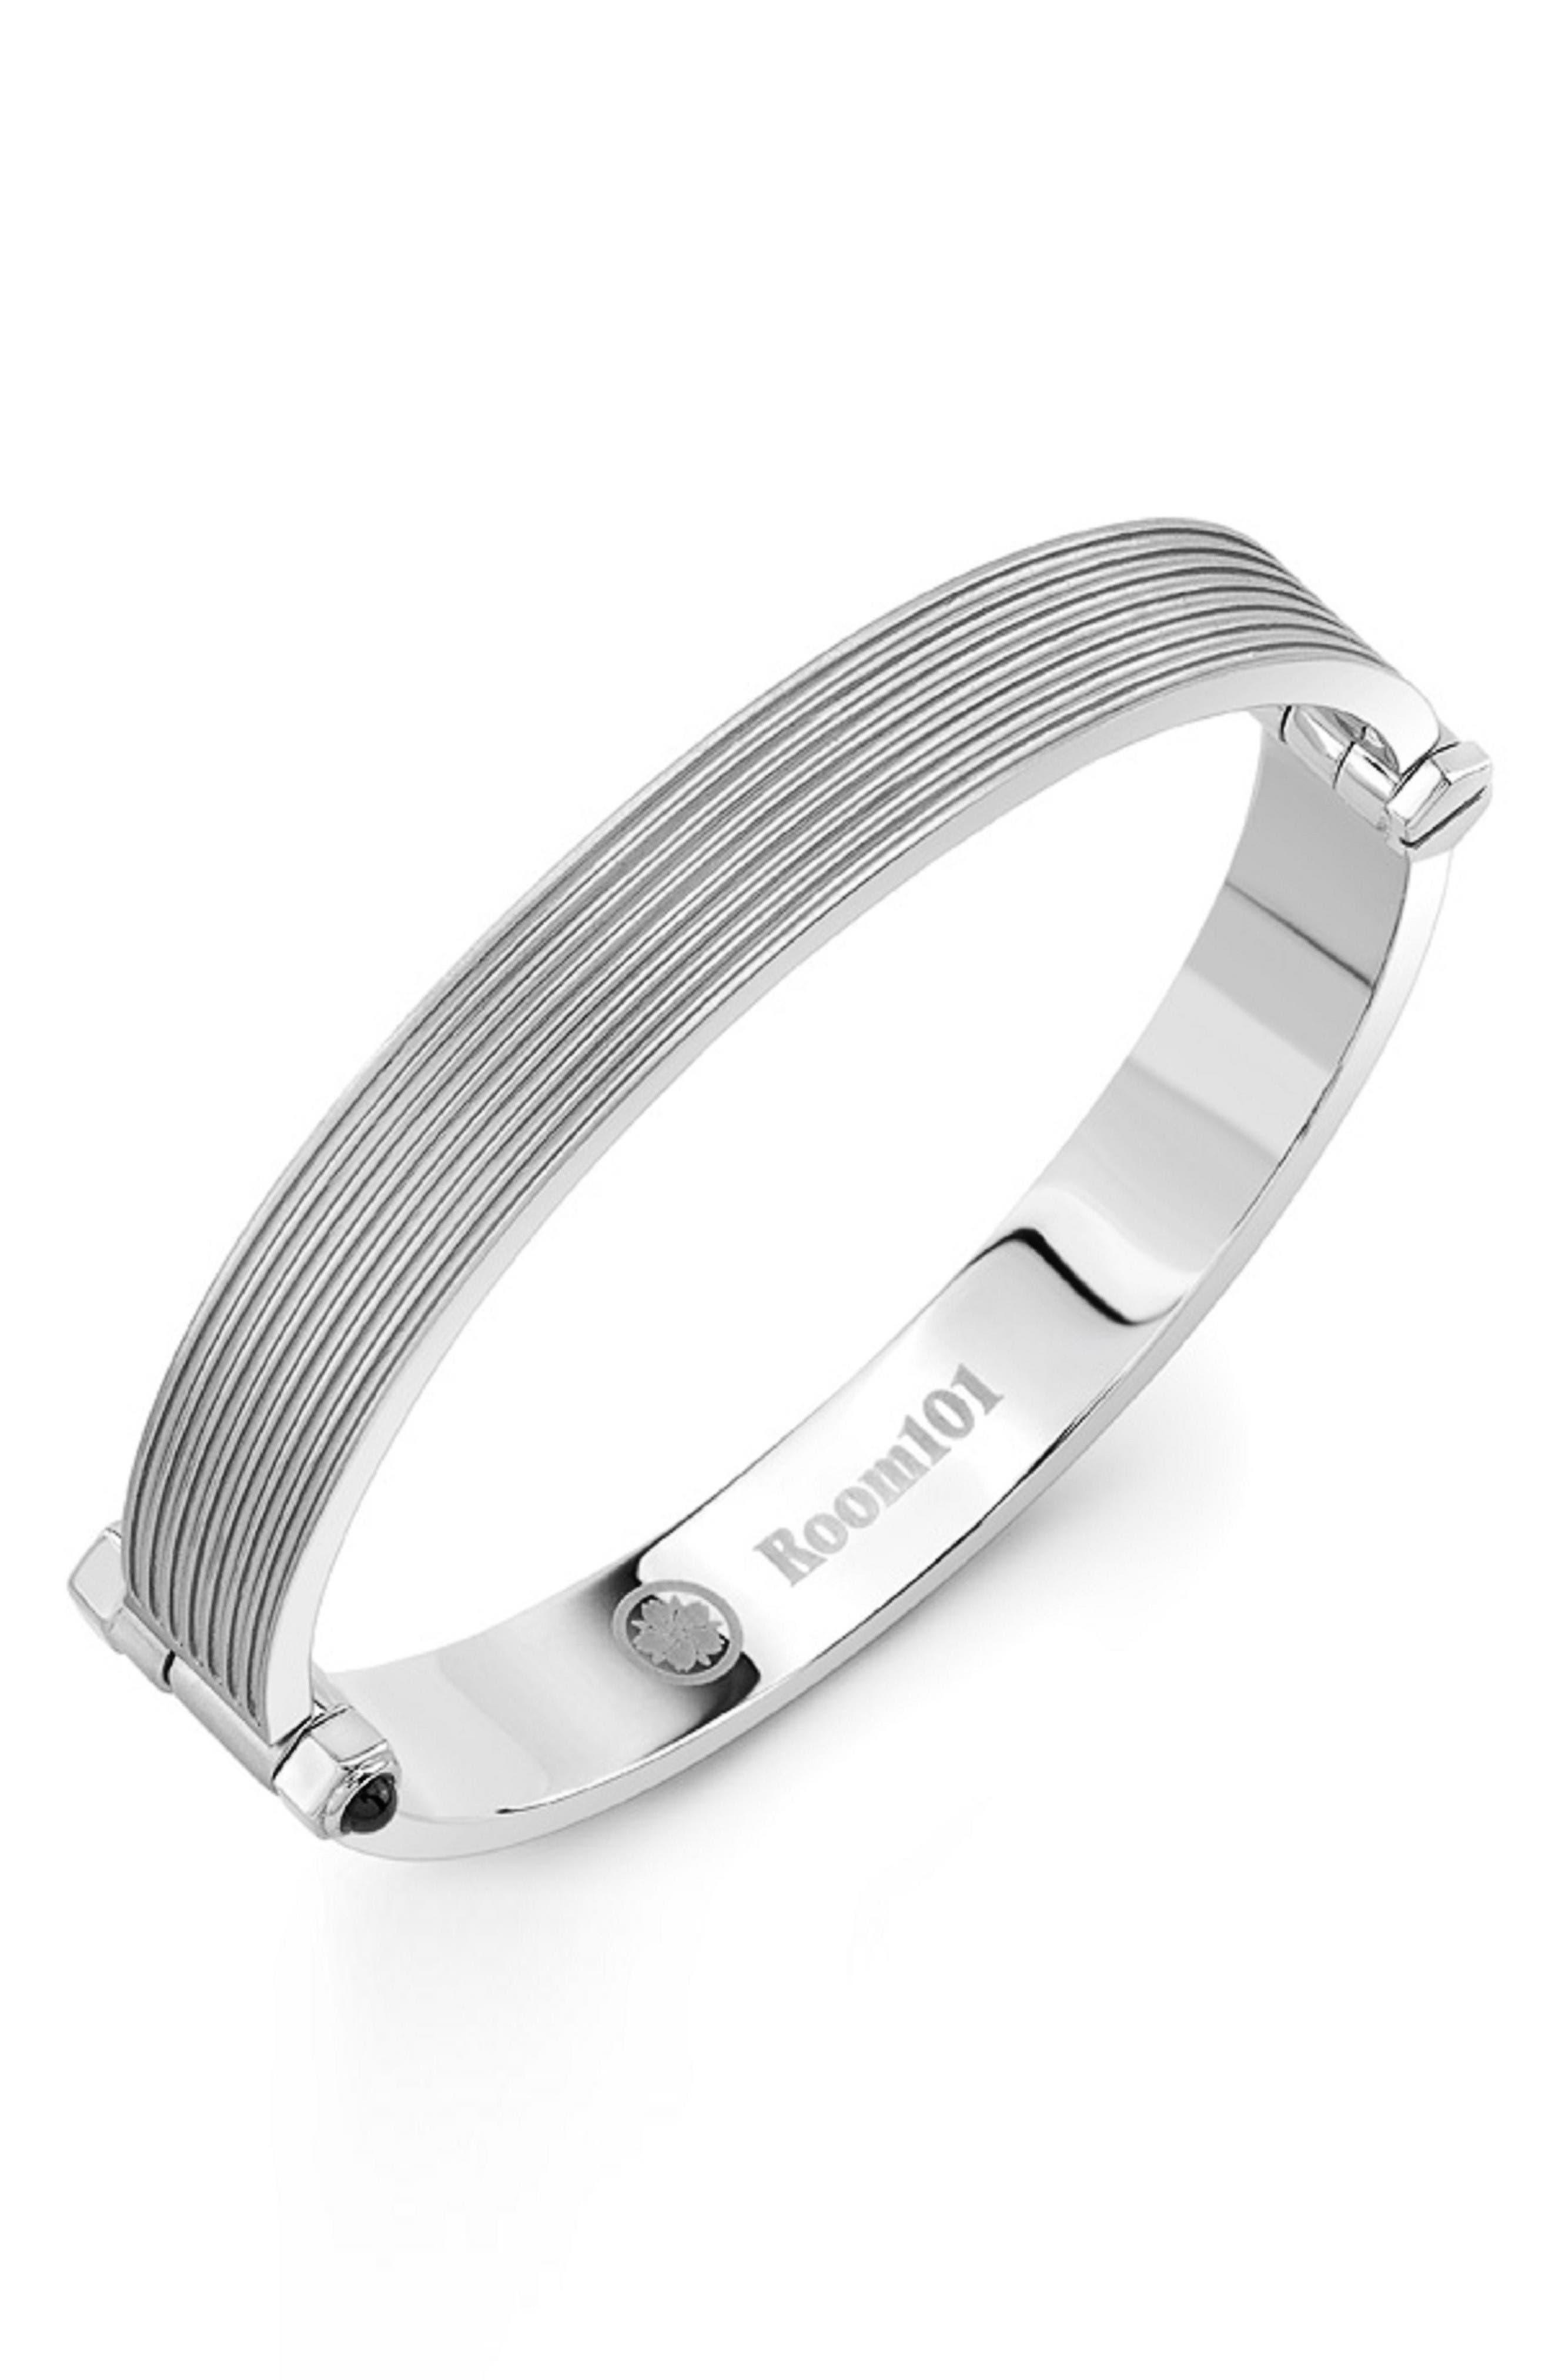 Alternate Image 1 Selected - Room101 Stainless Steel Bracelet